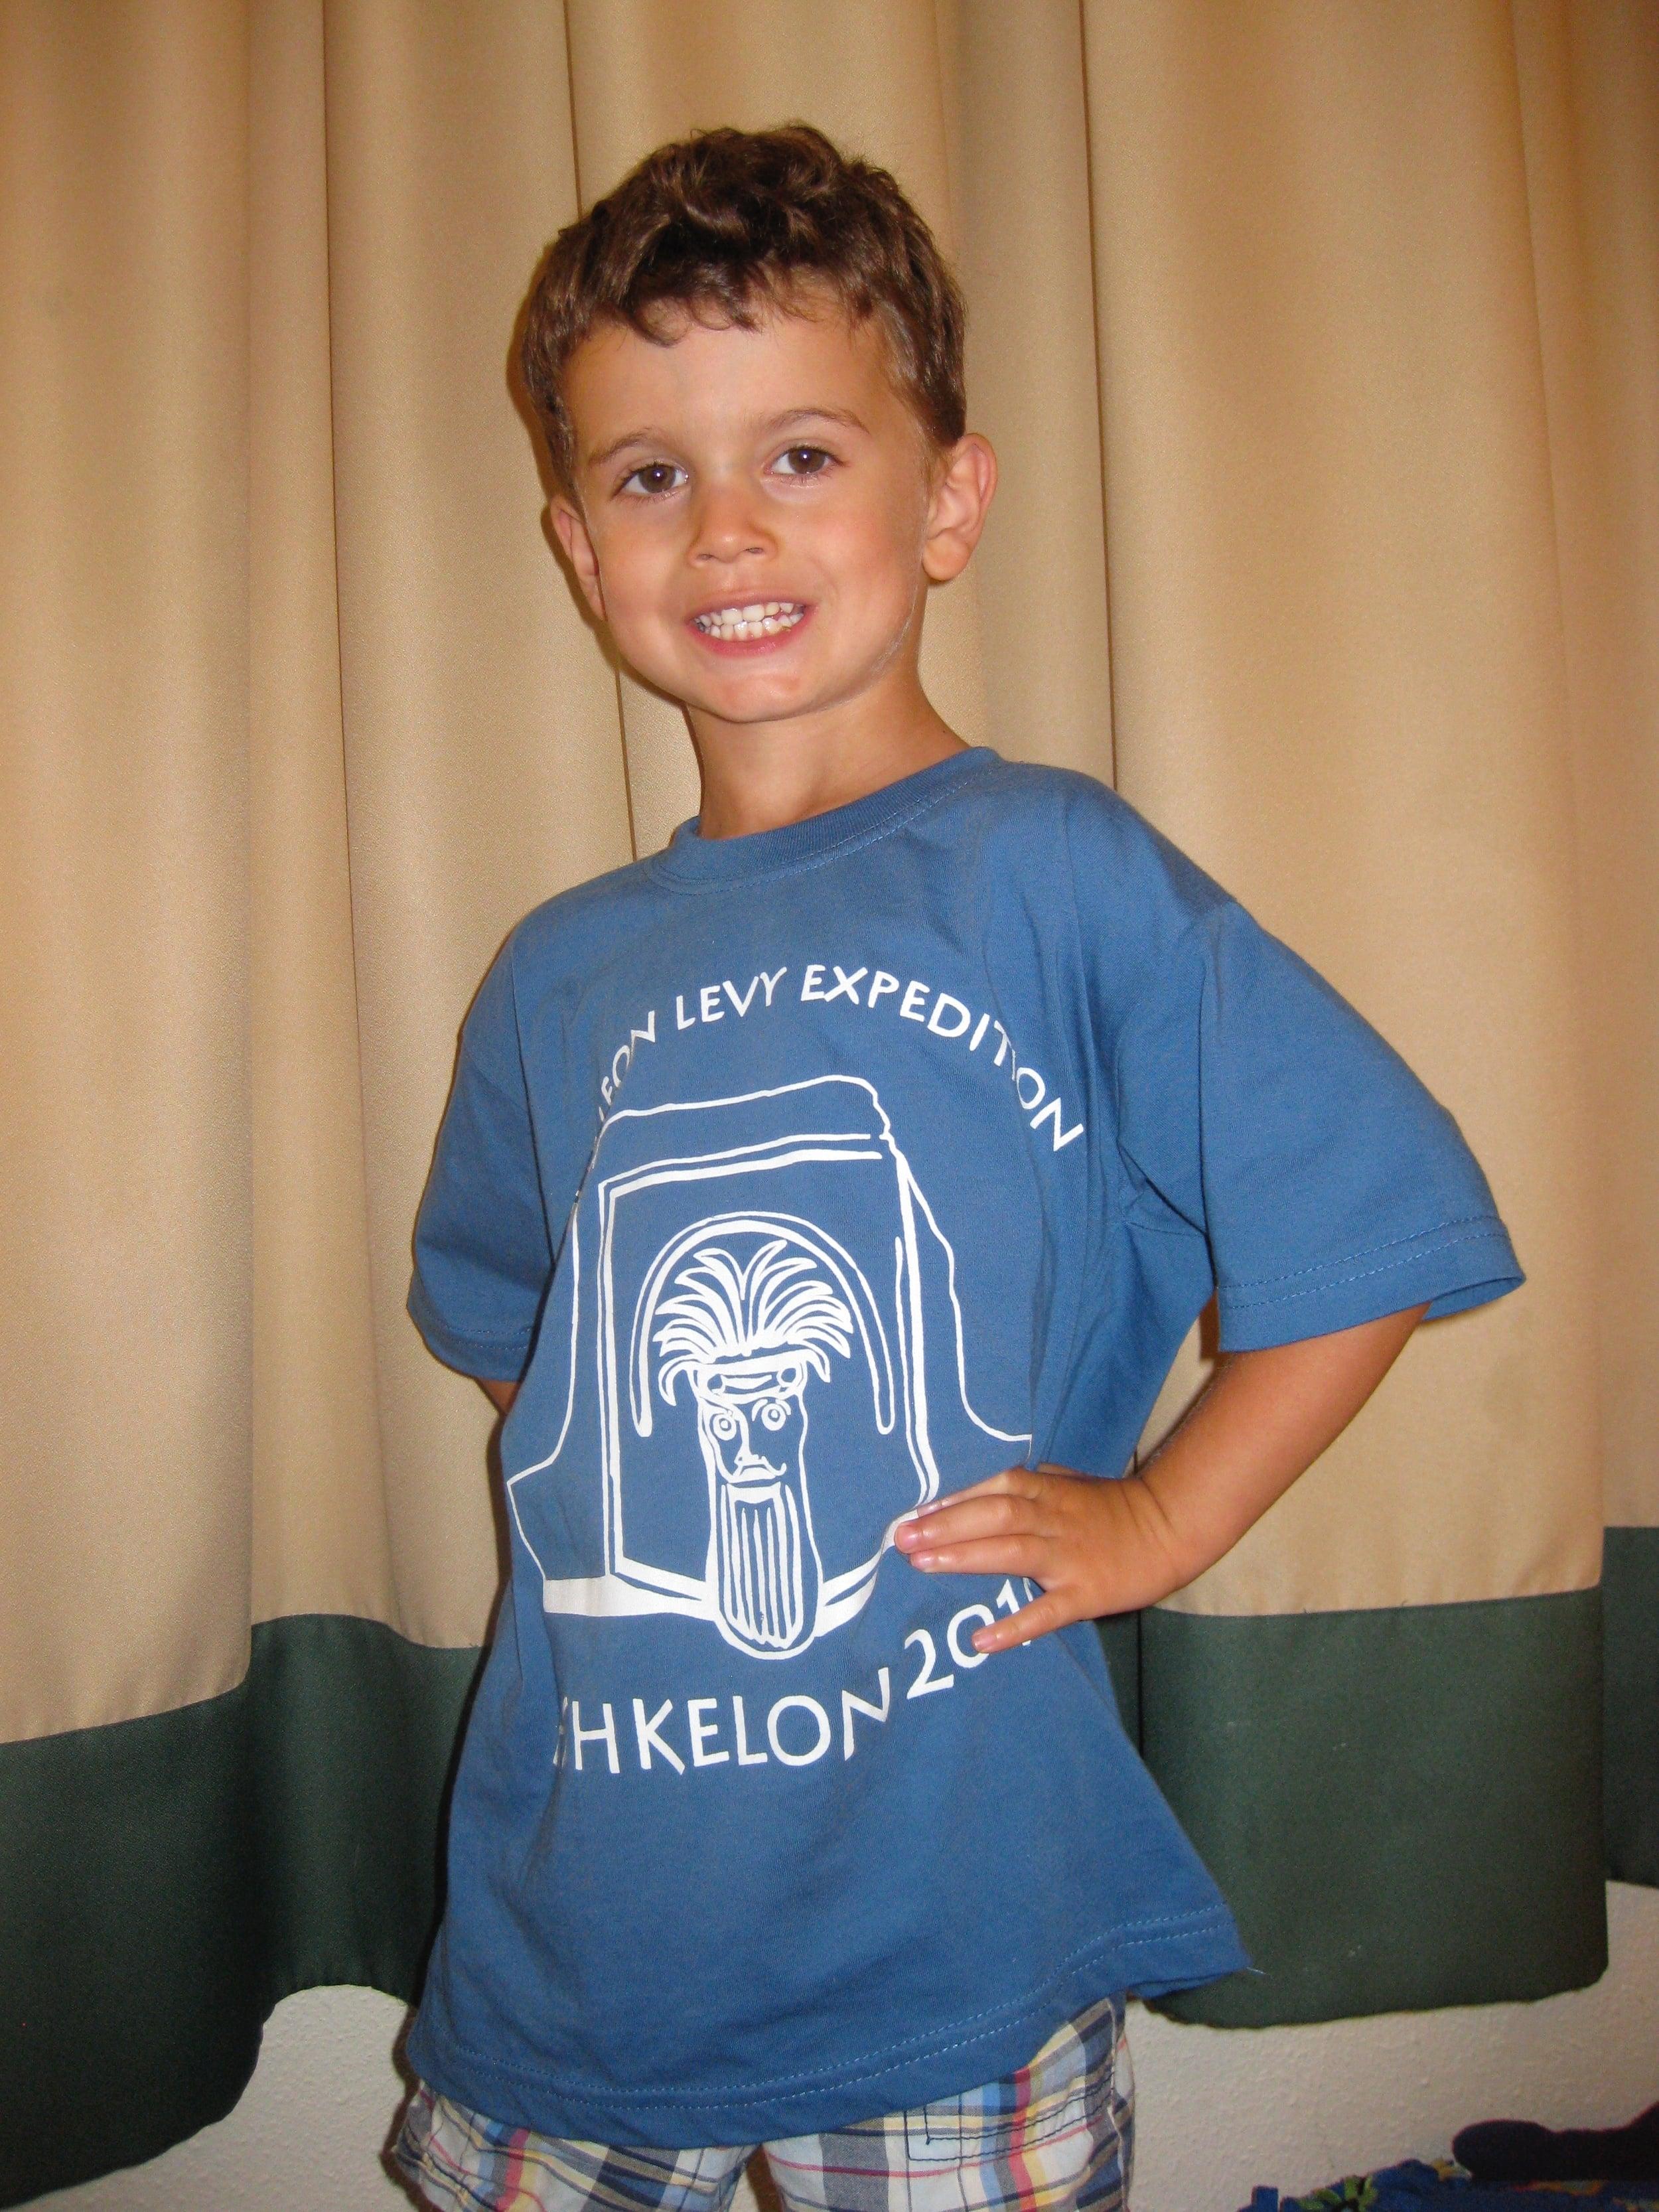 Ashkelon 2010 t-shirt